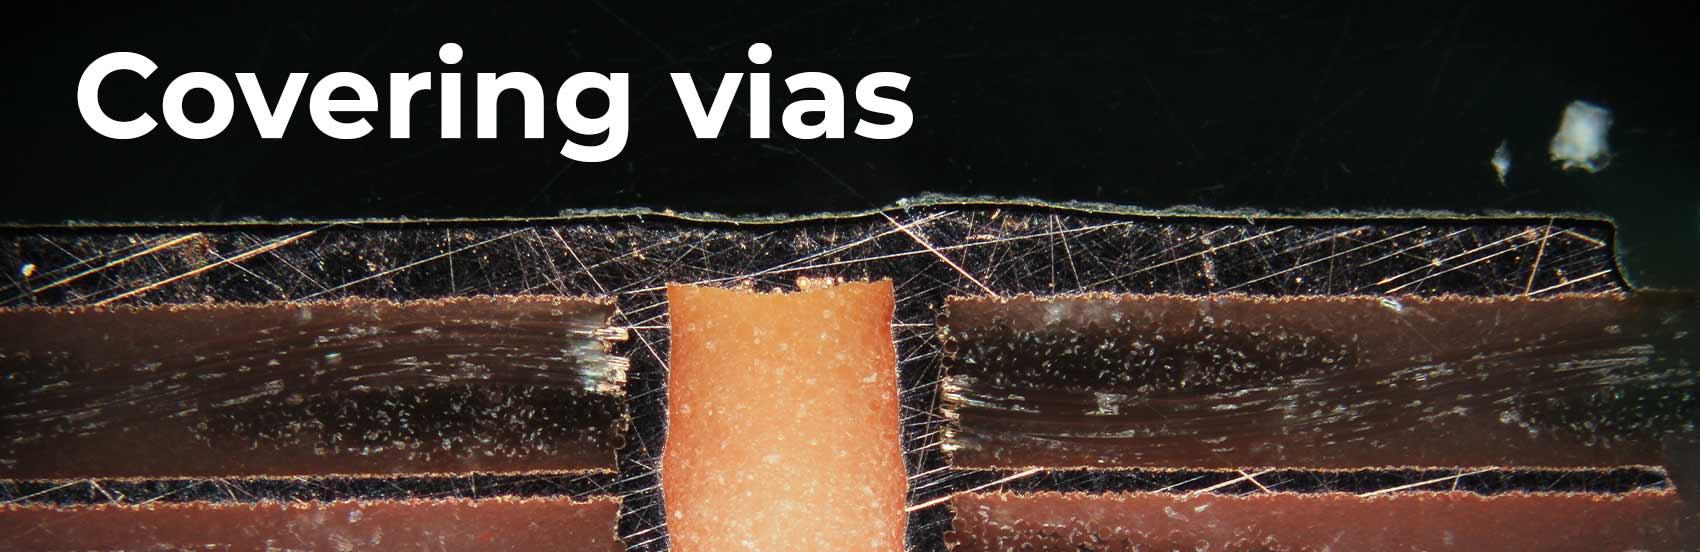 Covering-vias-Blog-Banner